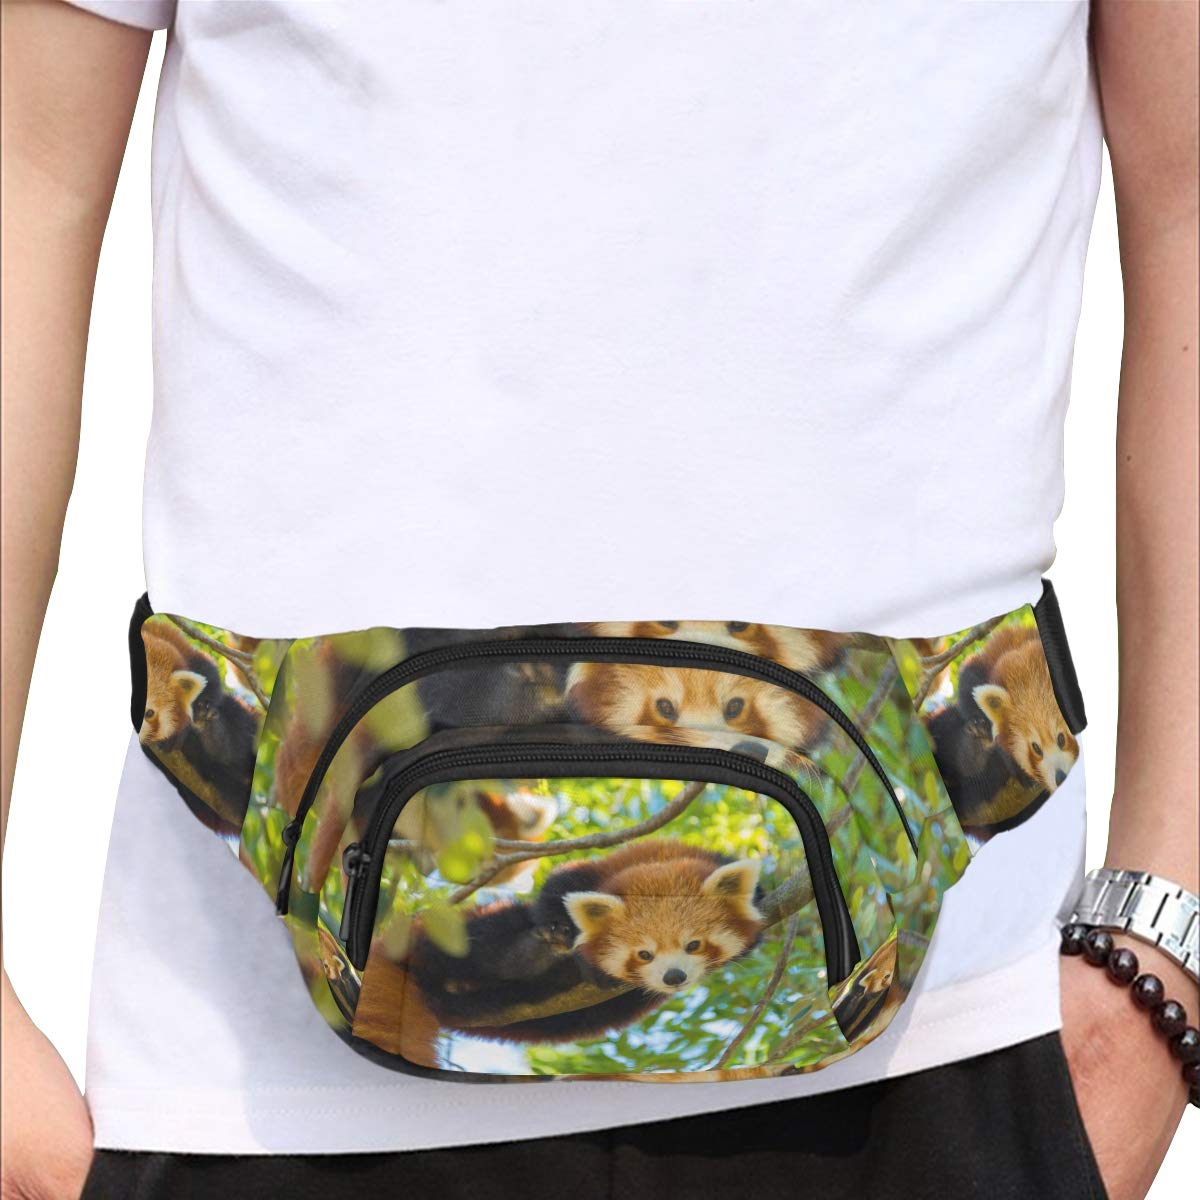 Beautiful Cute Red Panda Animal Fenny Packs Waist Bags Adjustable Belt Waterproof Nylon Travel Running Sport Vacation Party For Men Women Boys Girls Kids